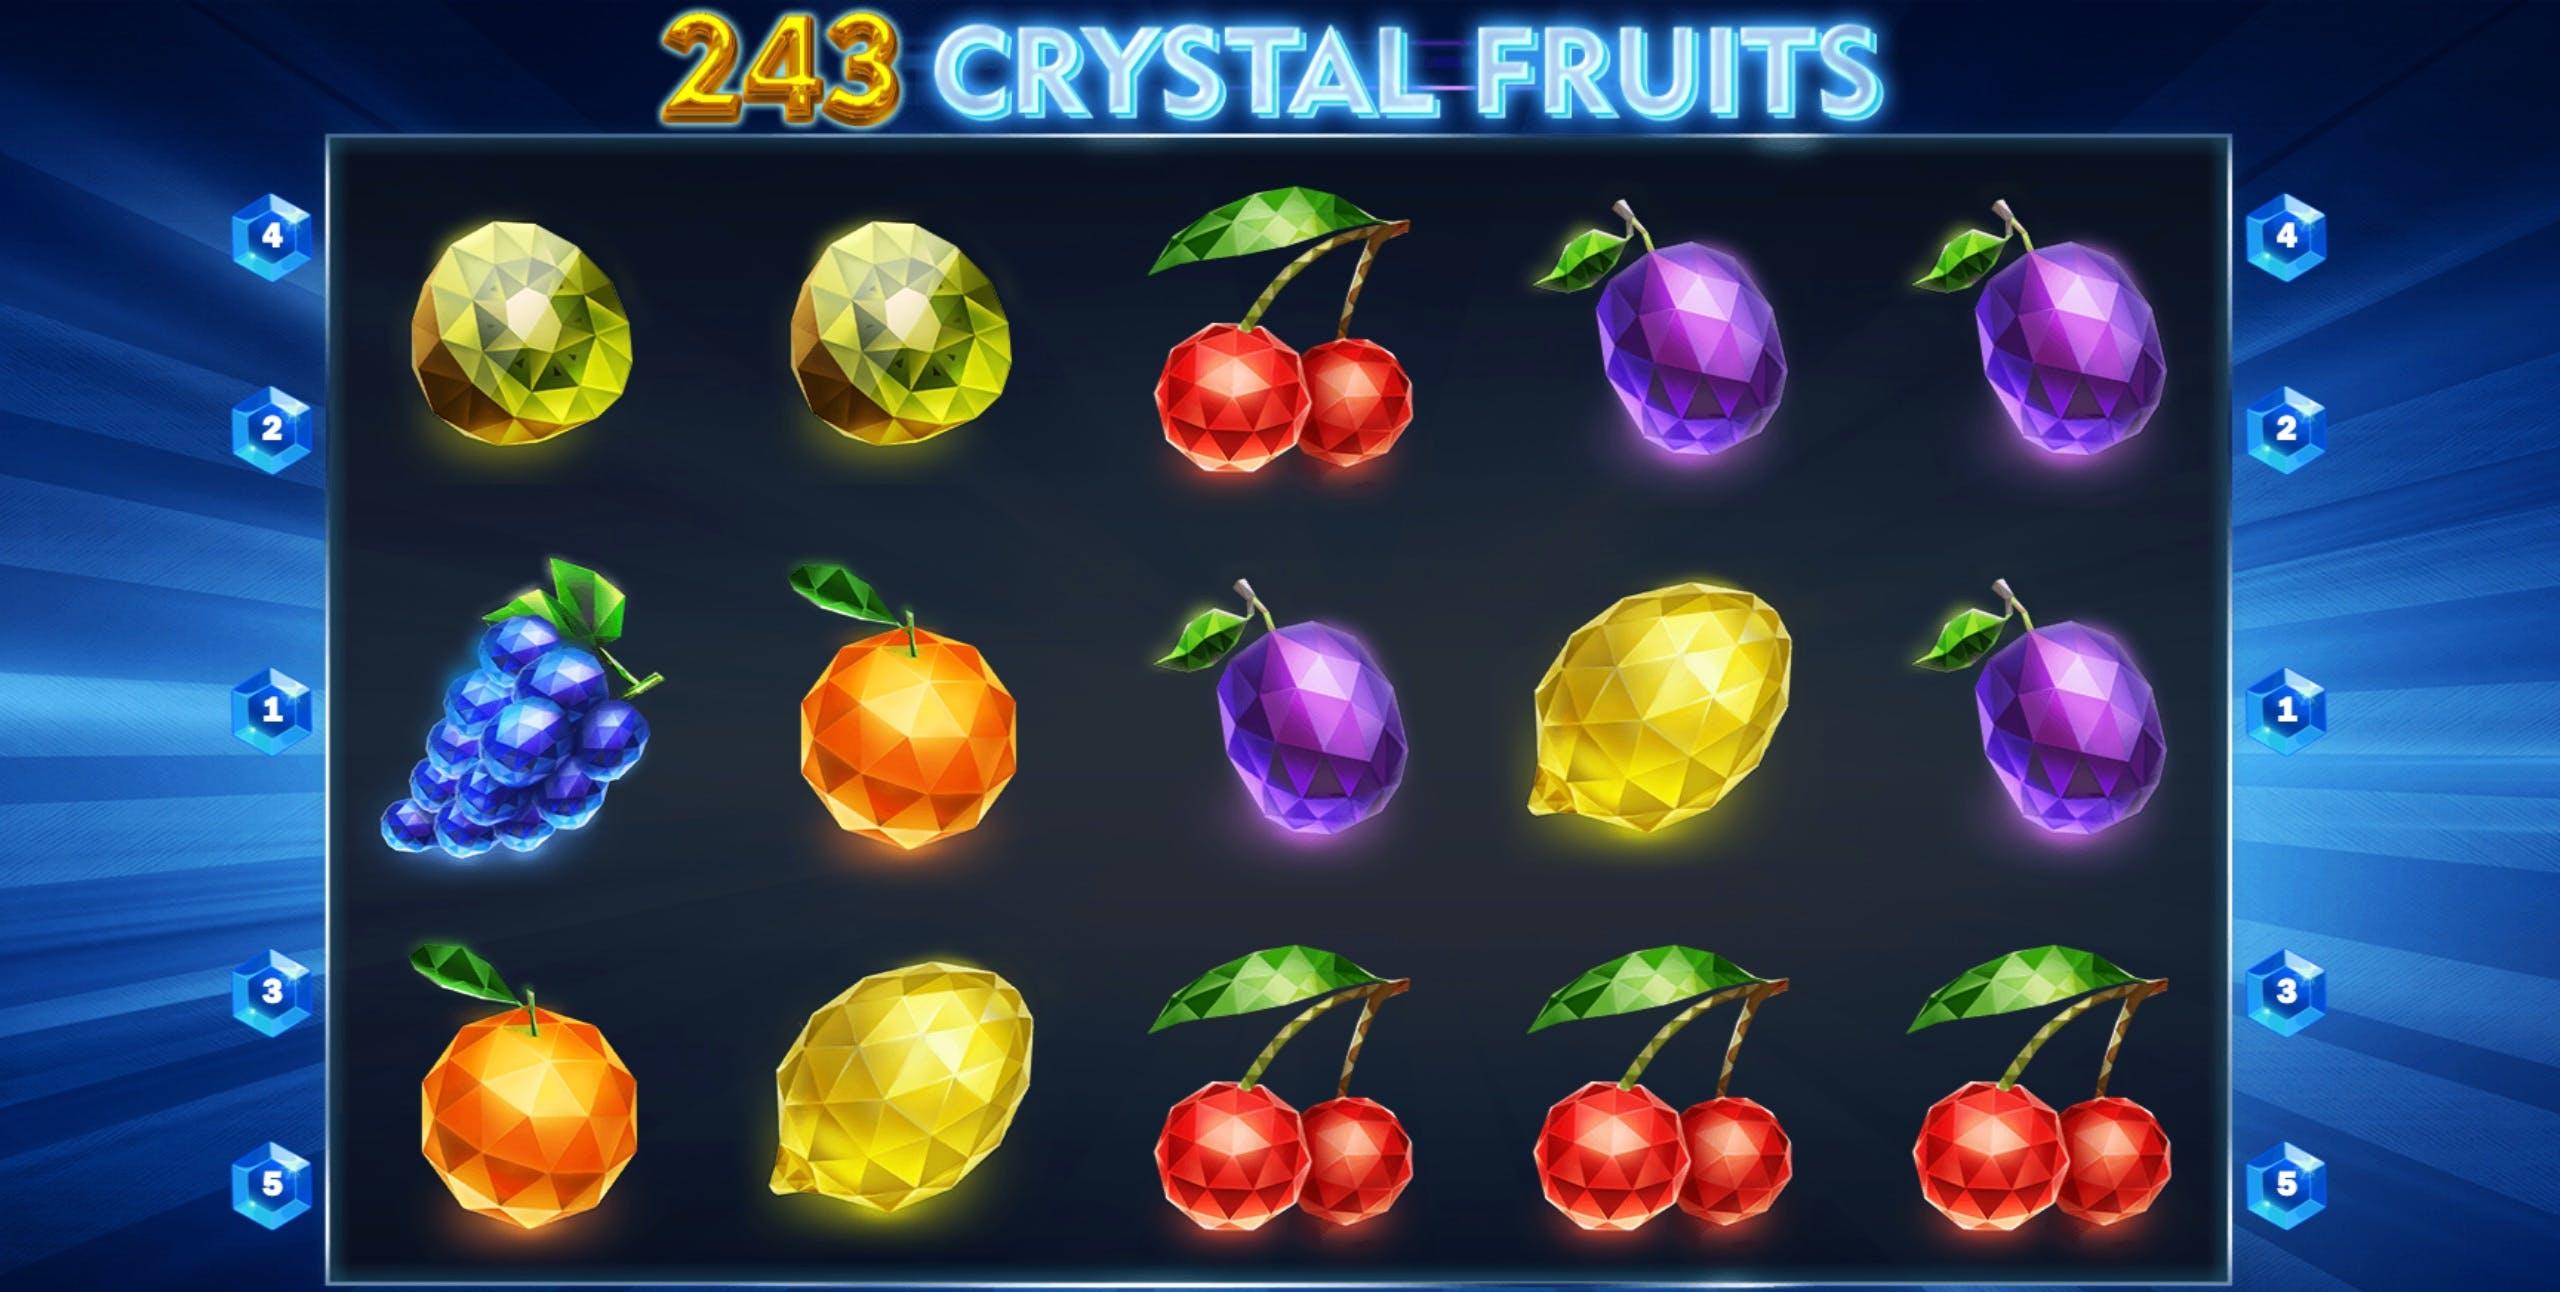 Game Xèng 243 Crystal Fruits, Game Xèng 243 Crystal Fruits HappyLuke